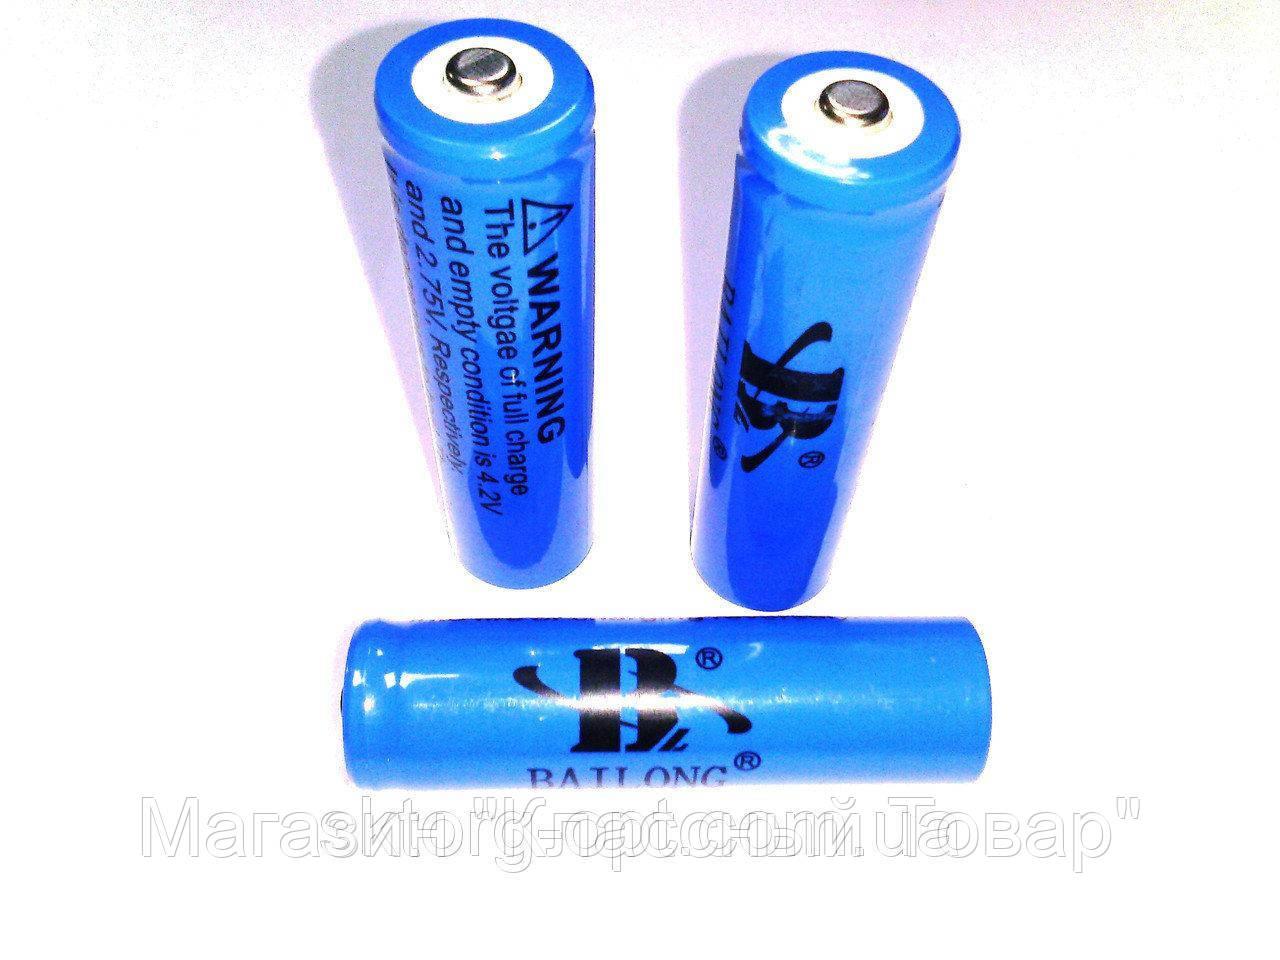 SALE!Батарейка,GH 18650 blue 4200 mAh 4.2v